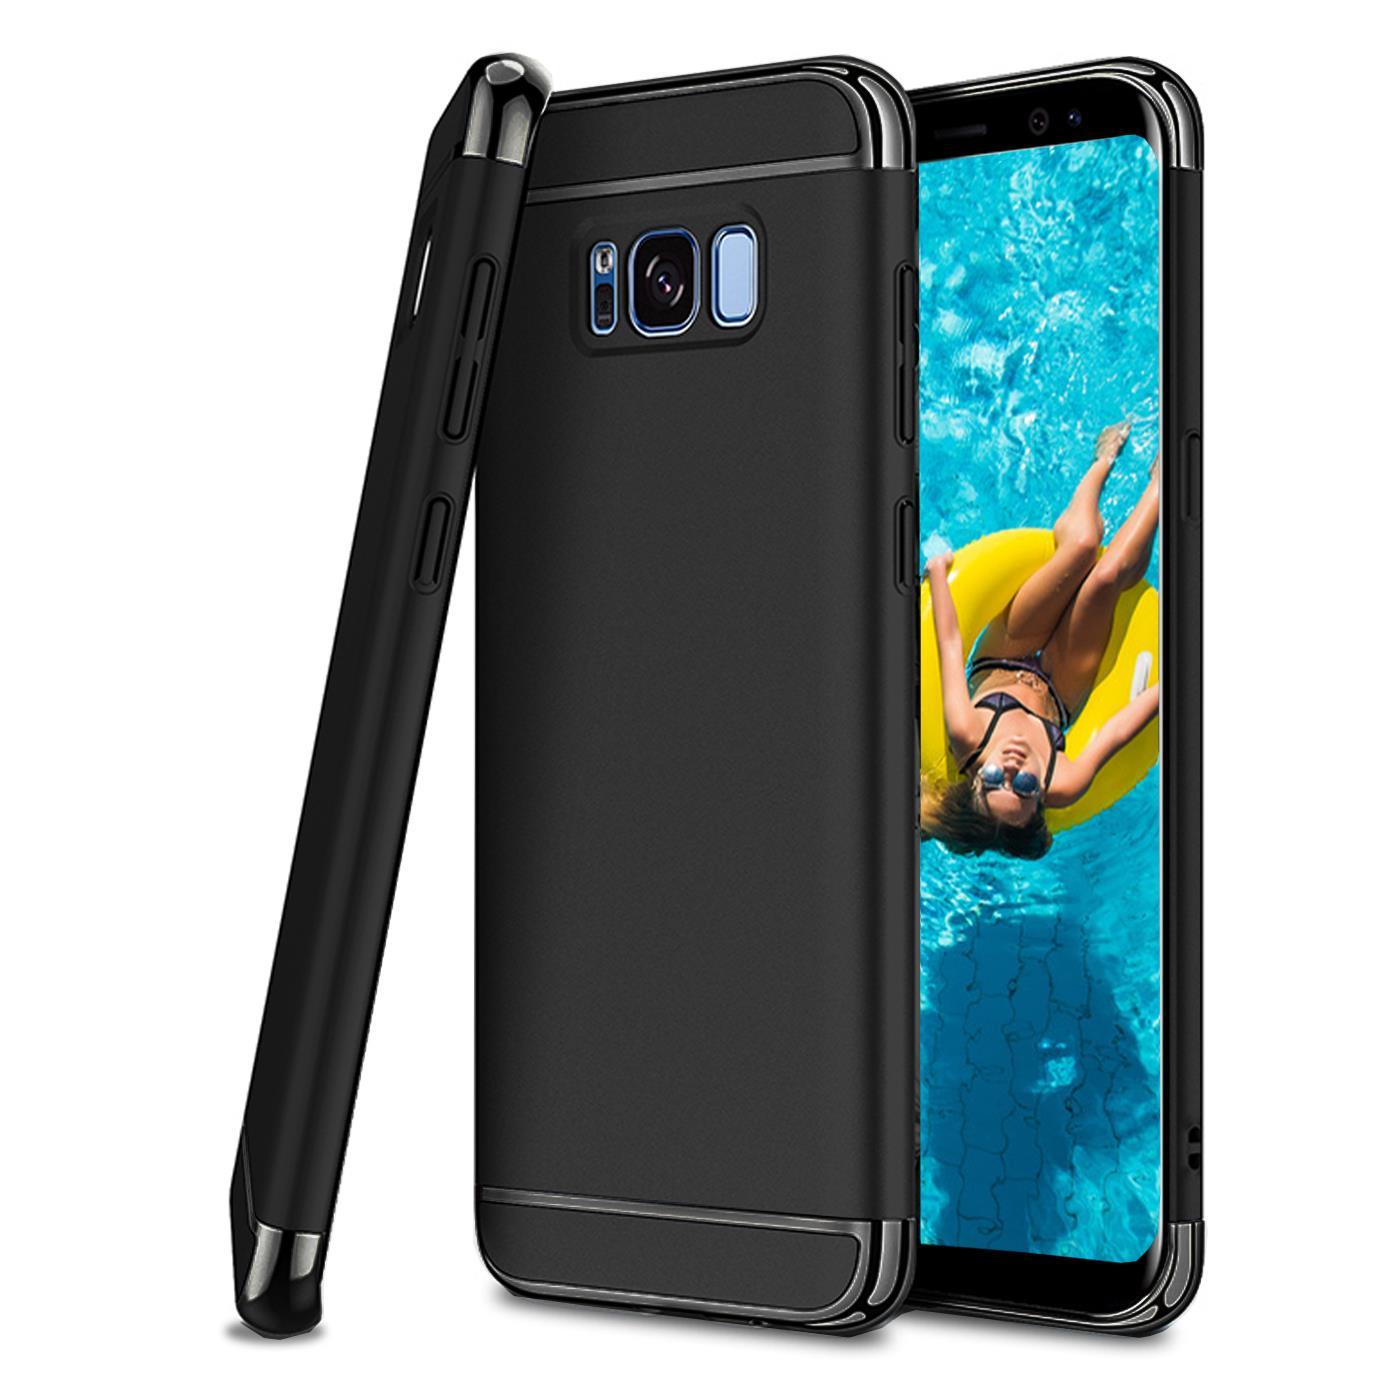 Samsung-Galaxy-S8-Hard-Back-Case-Cover-Thin-Bumper-Slim-Shockproof-Rugged-Thin thumbnail 2